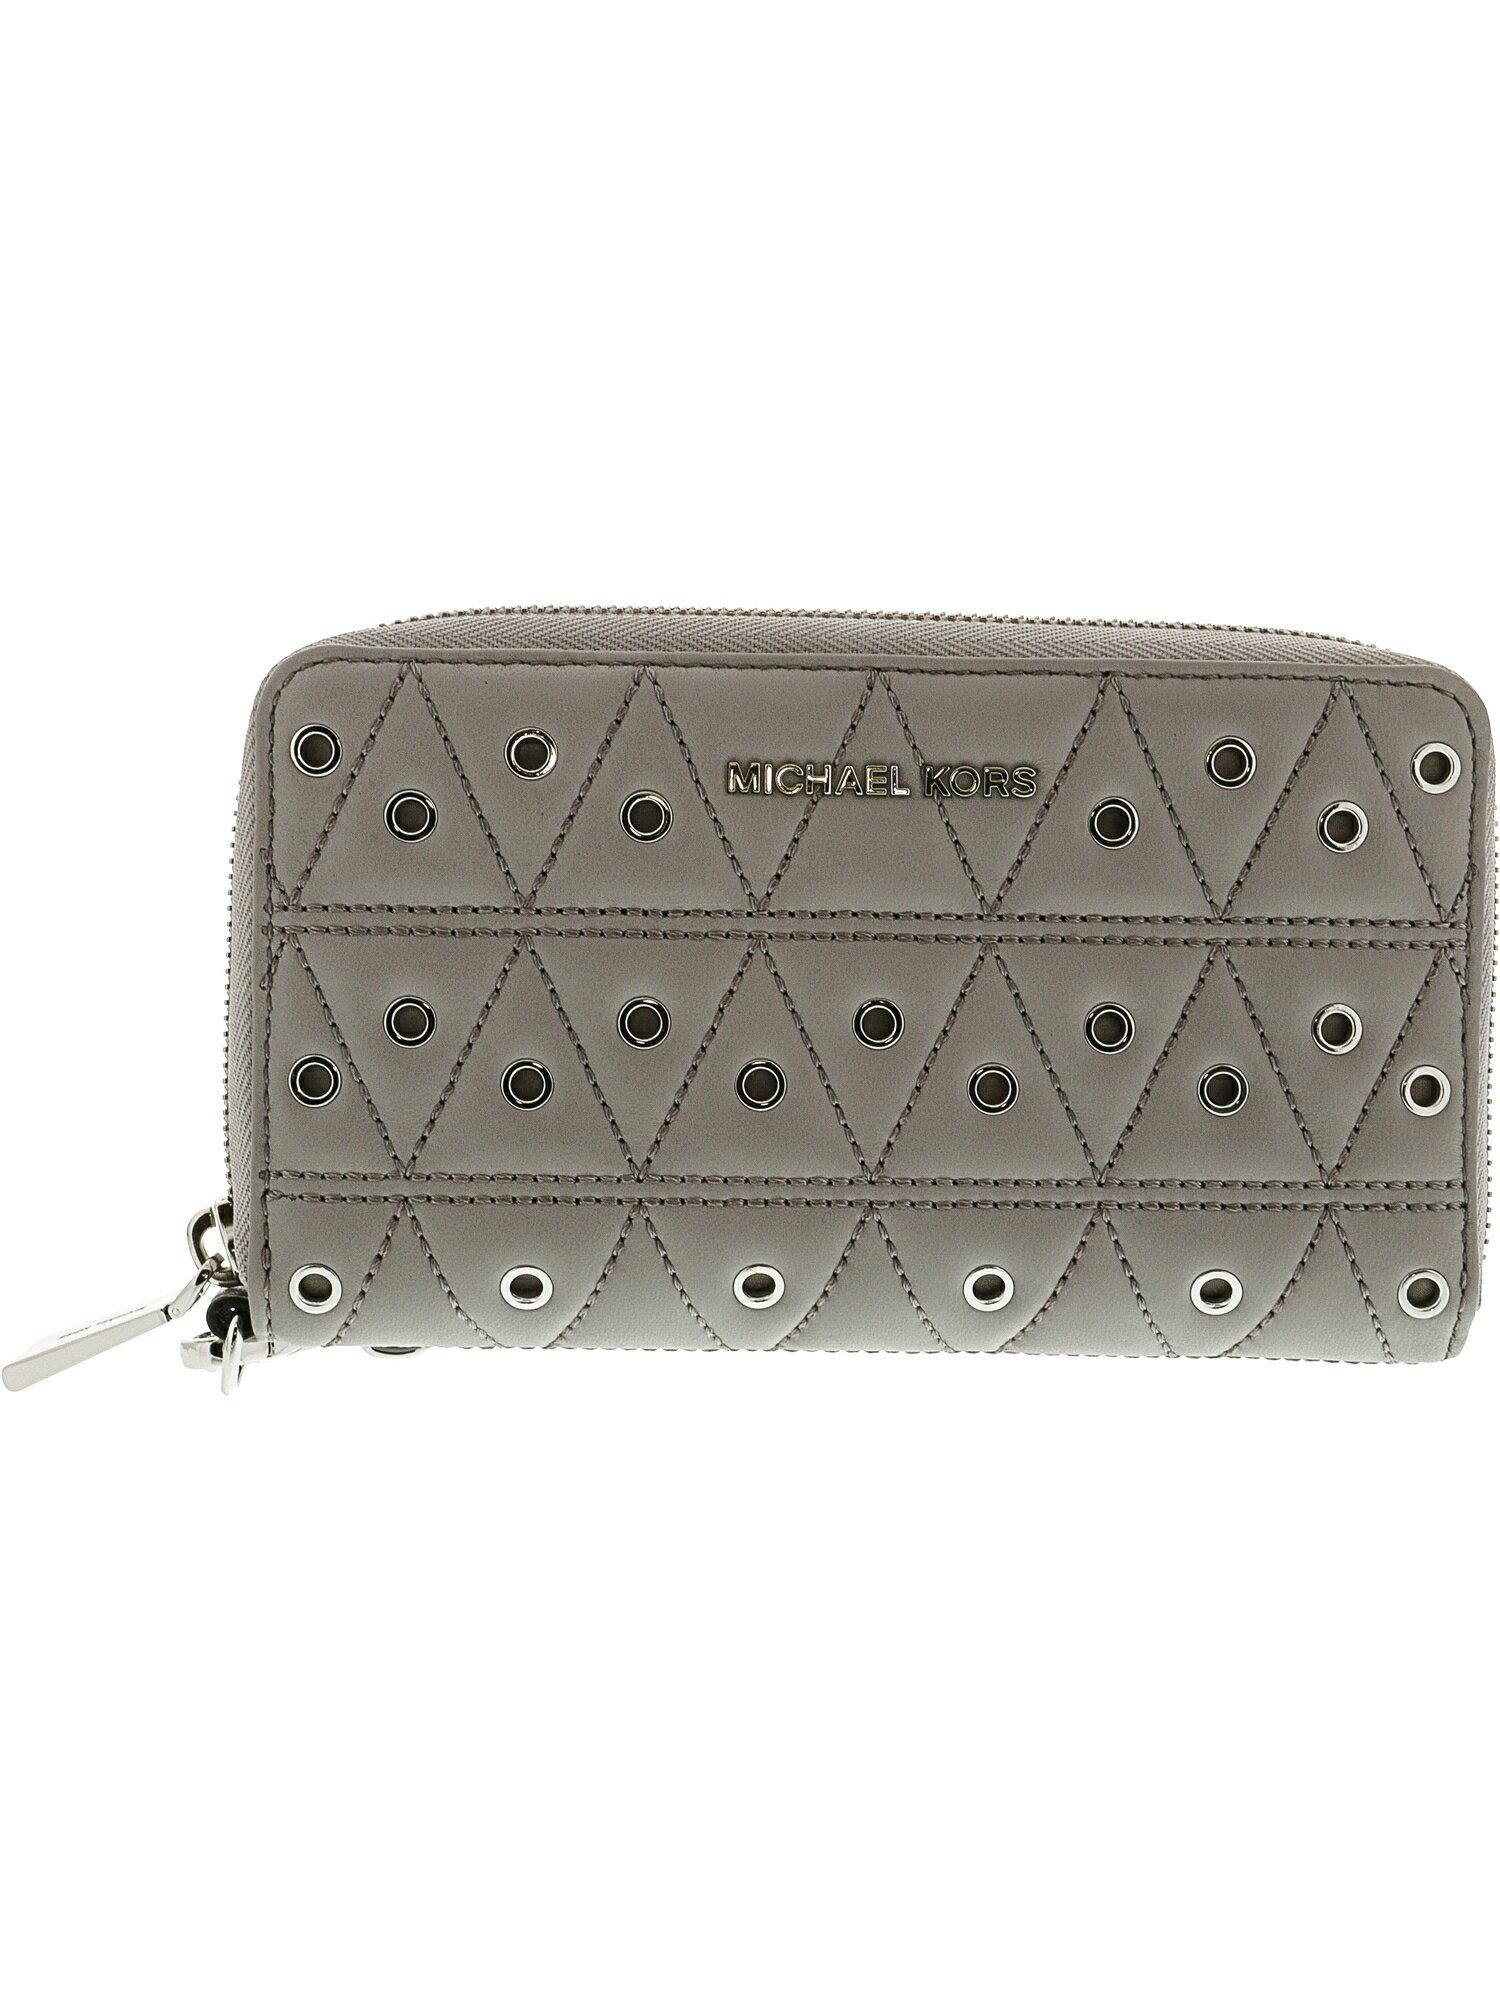 909b1863c6aee0 Michael Kors Women's Large Flat Phone Case Leather Wristlet - Pearl Grey 0